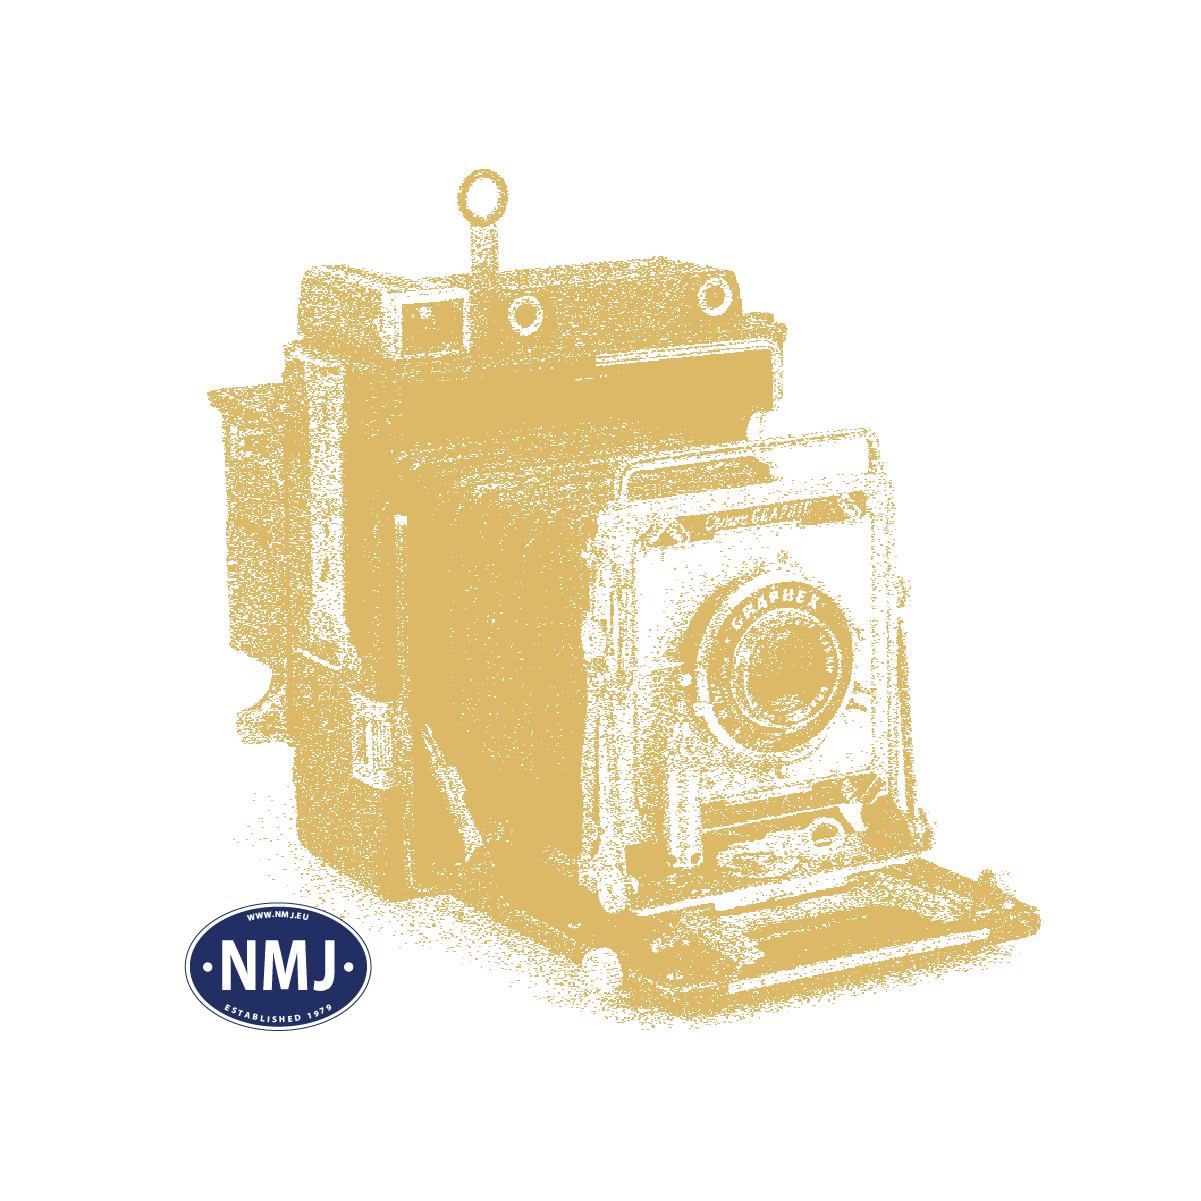 NMJSTl460256 - NMJ Superline NSB Stakevogn Tl4 60256 m/ Sidelemmer